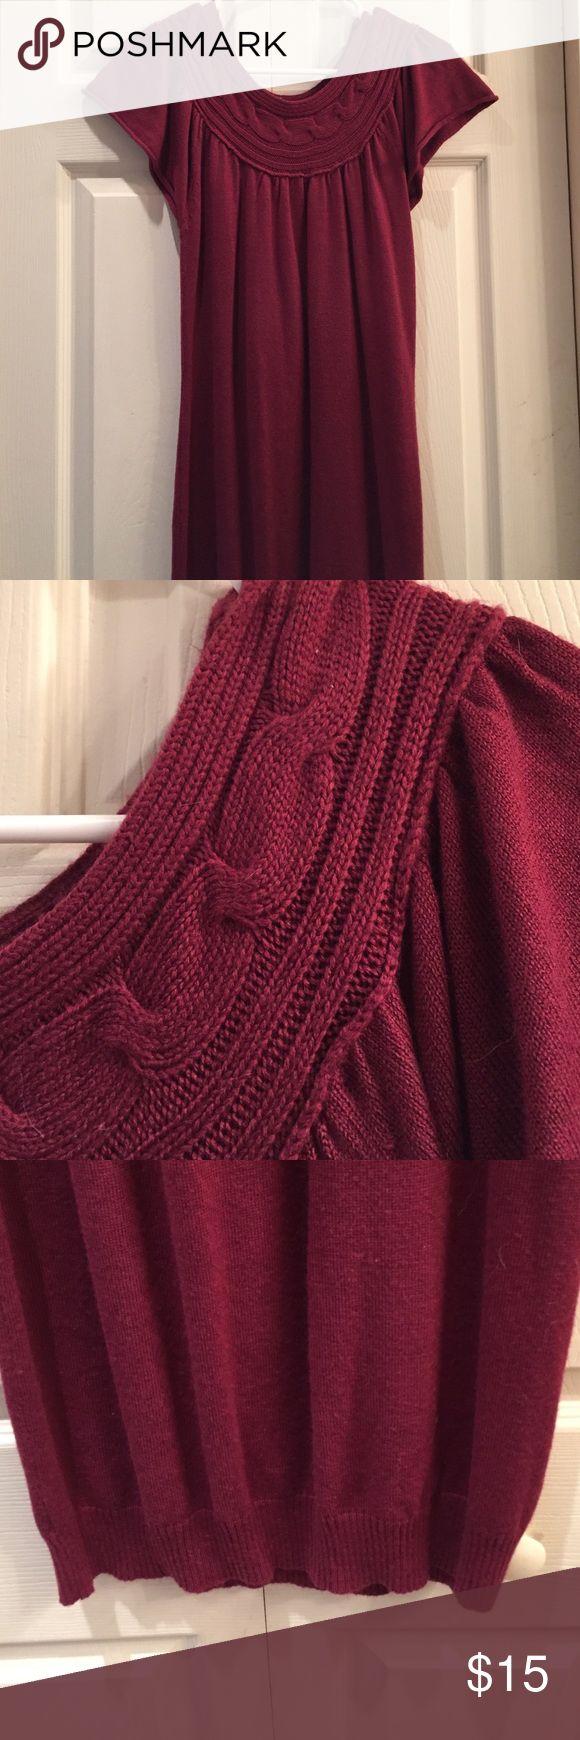 Sweater dress Burgundy sweater dress. Worn minimally Dresses Midi